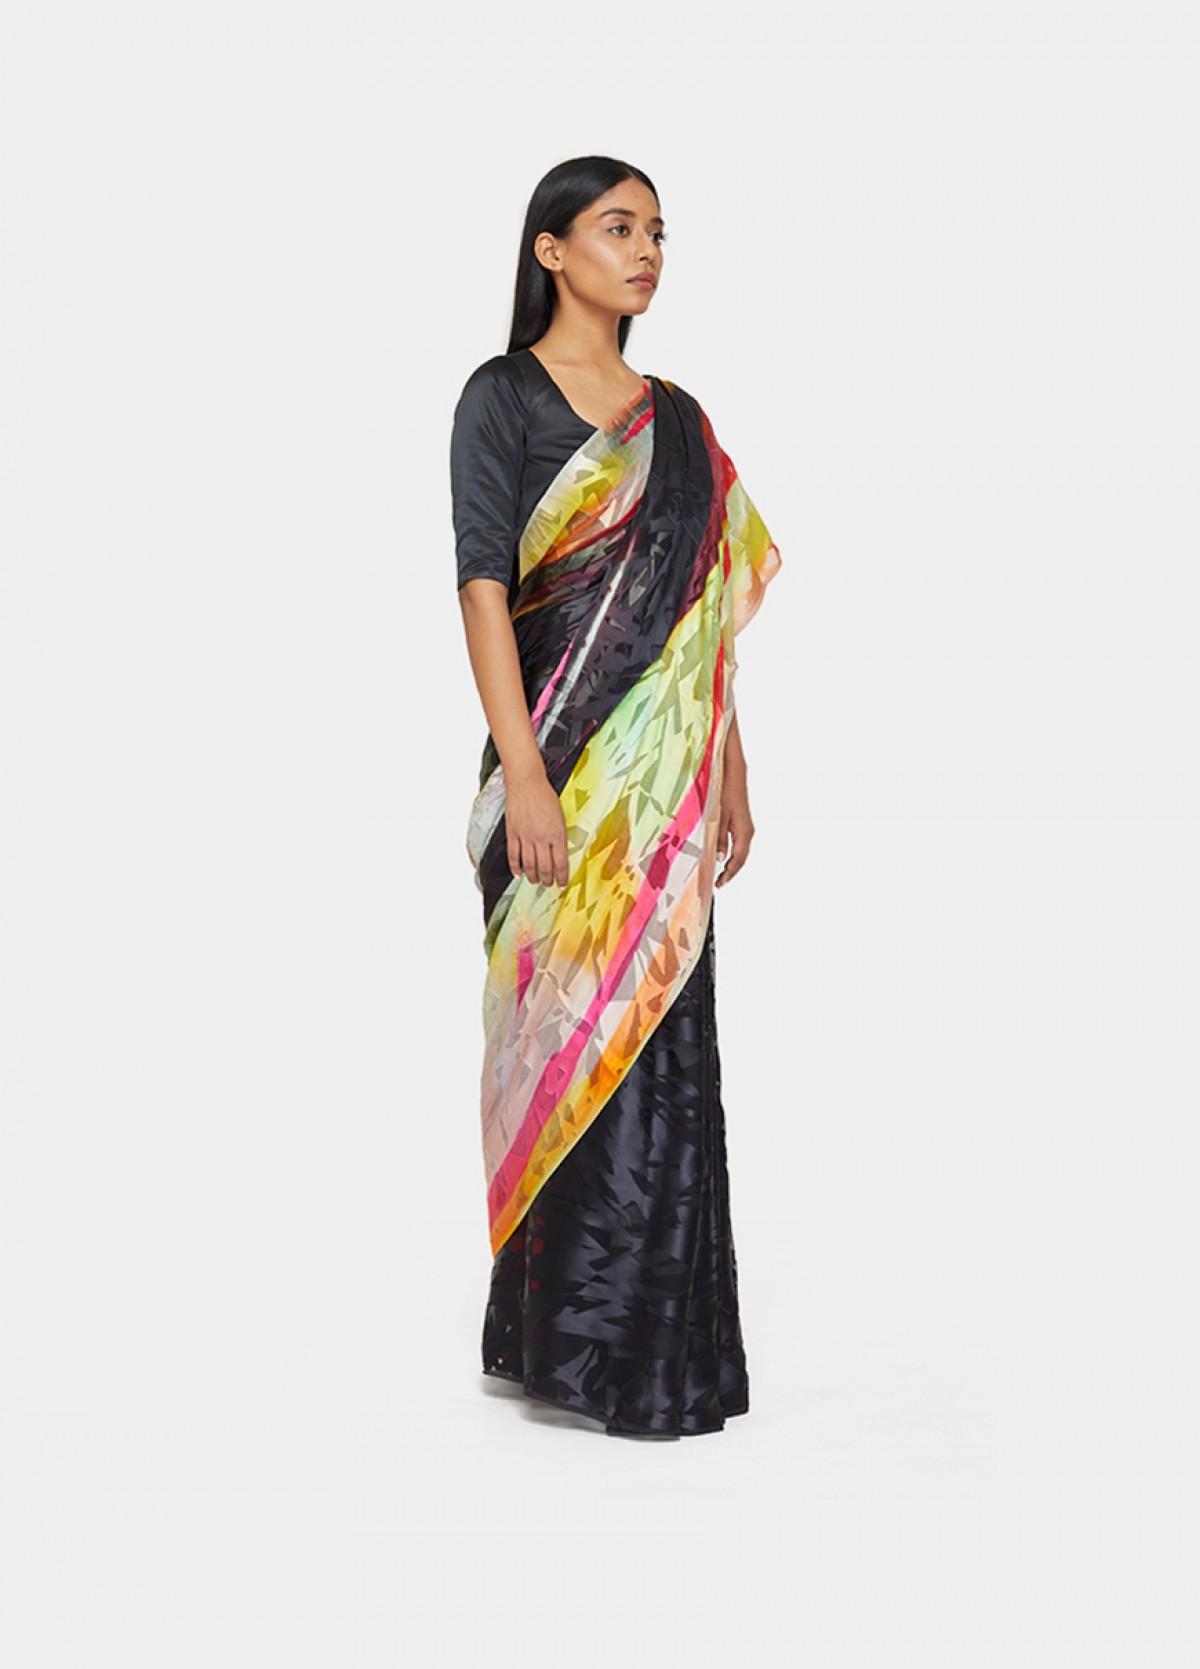 The Fragrance Sari